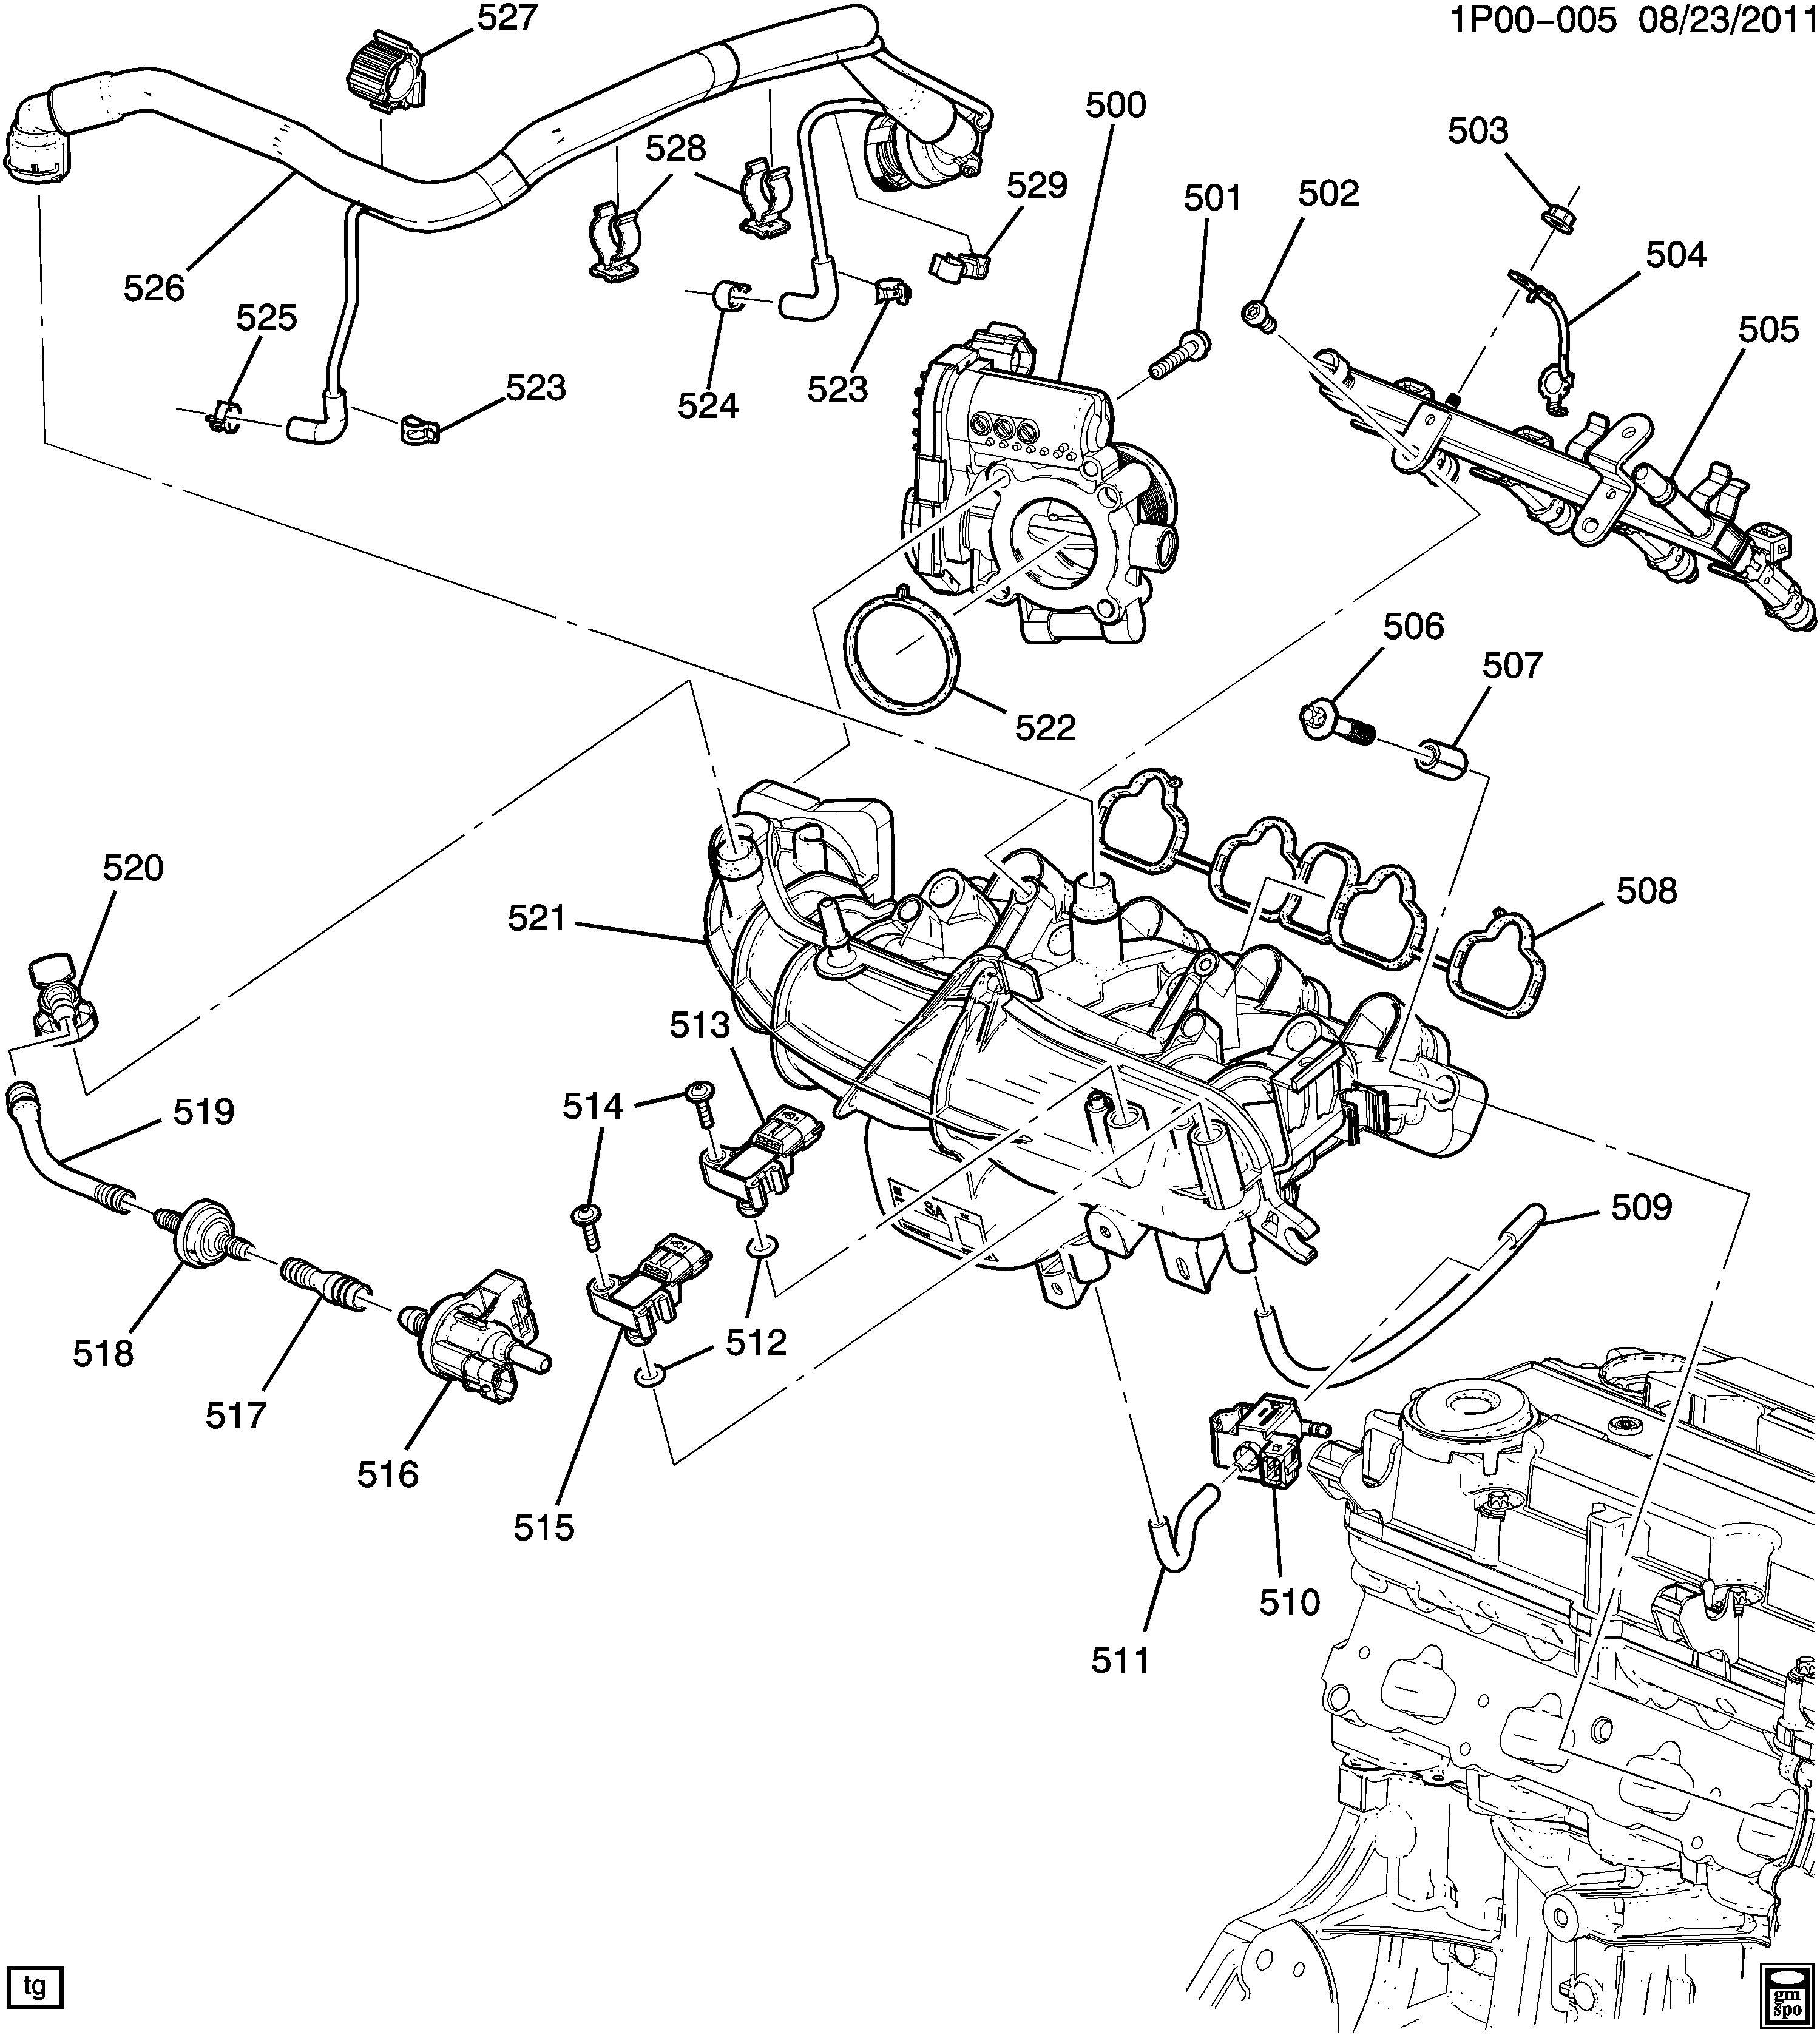 Chevrolet Cruze Manifold Engine Fuel Intake Manifold